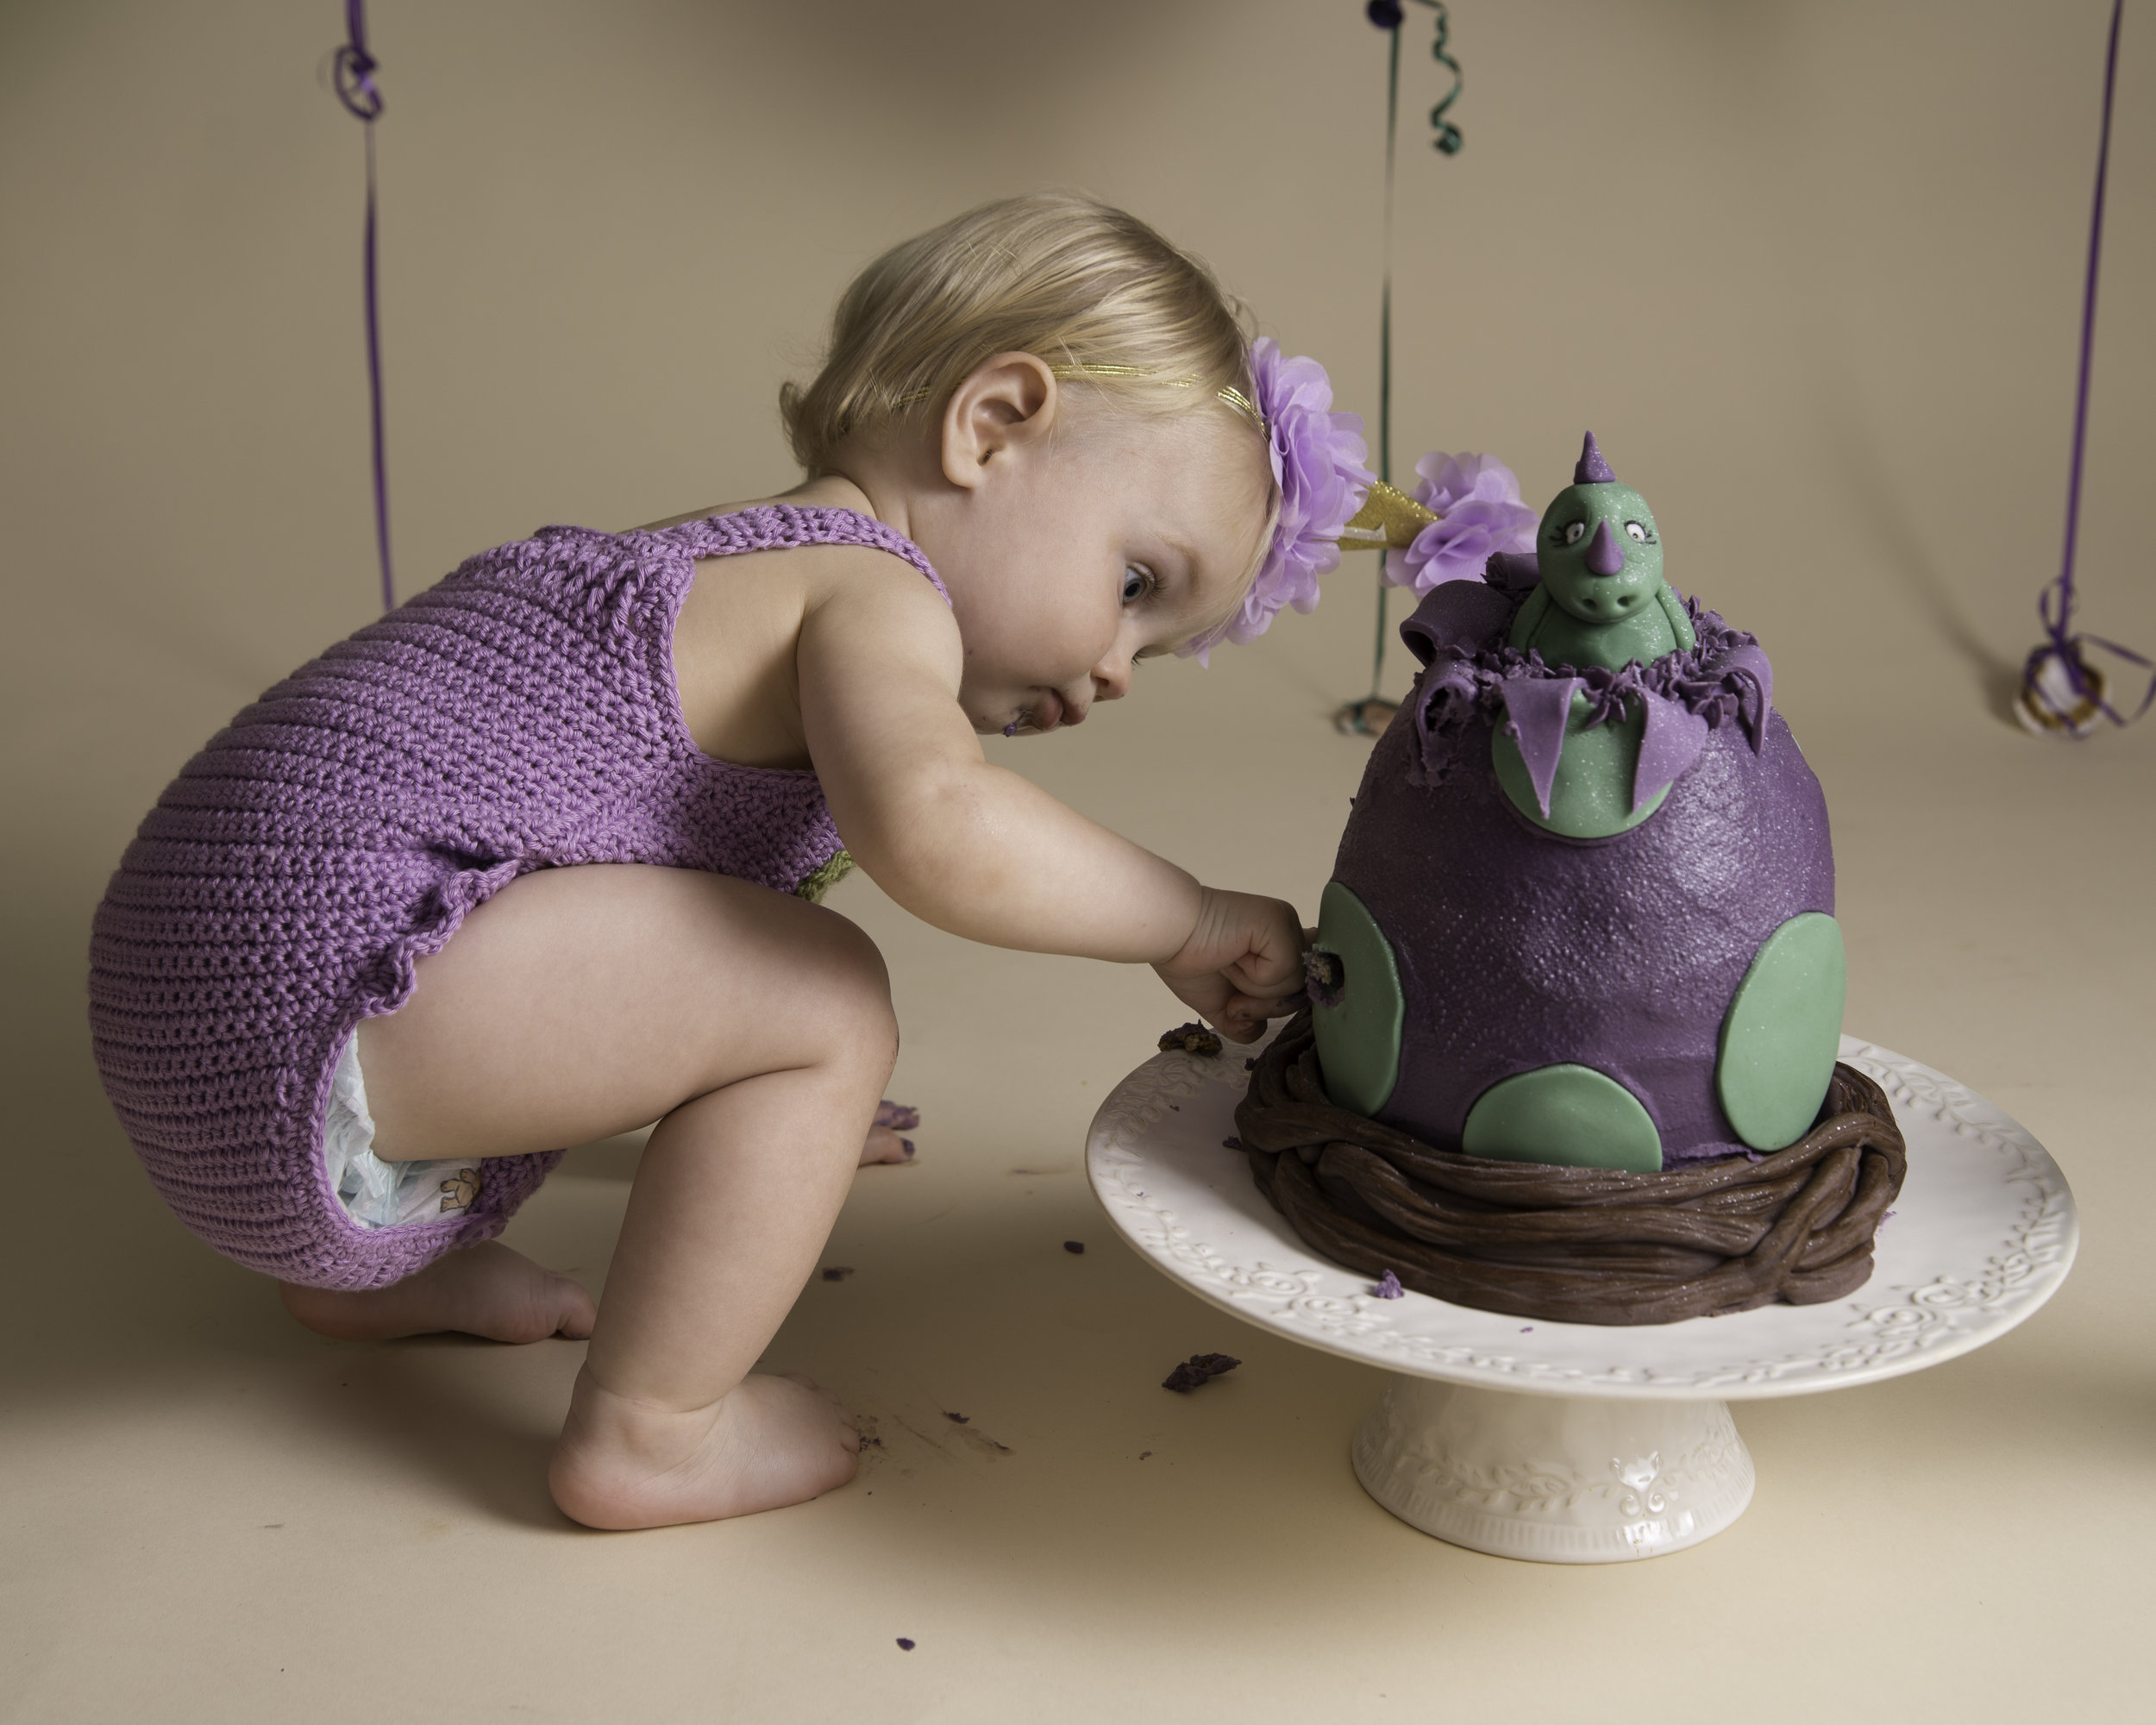 Ipswich_Suffolk_Cake_Smash_Splash_Photography_konjo_photography (6).jpg